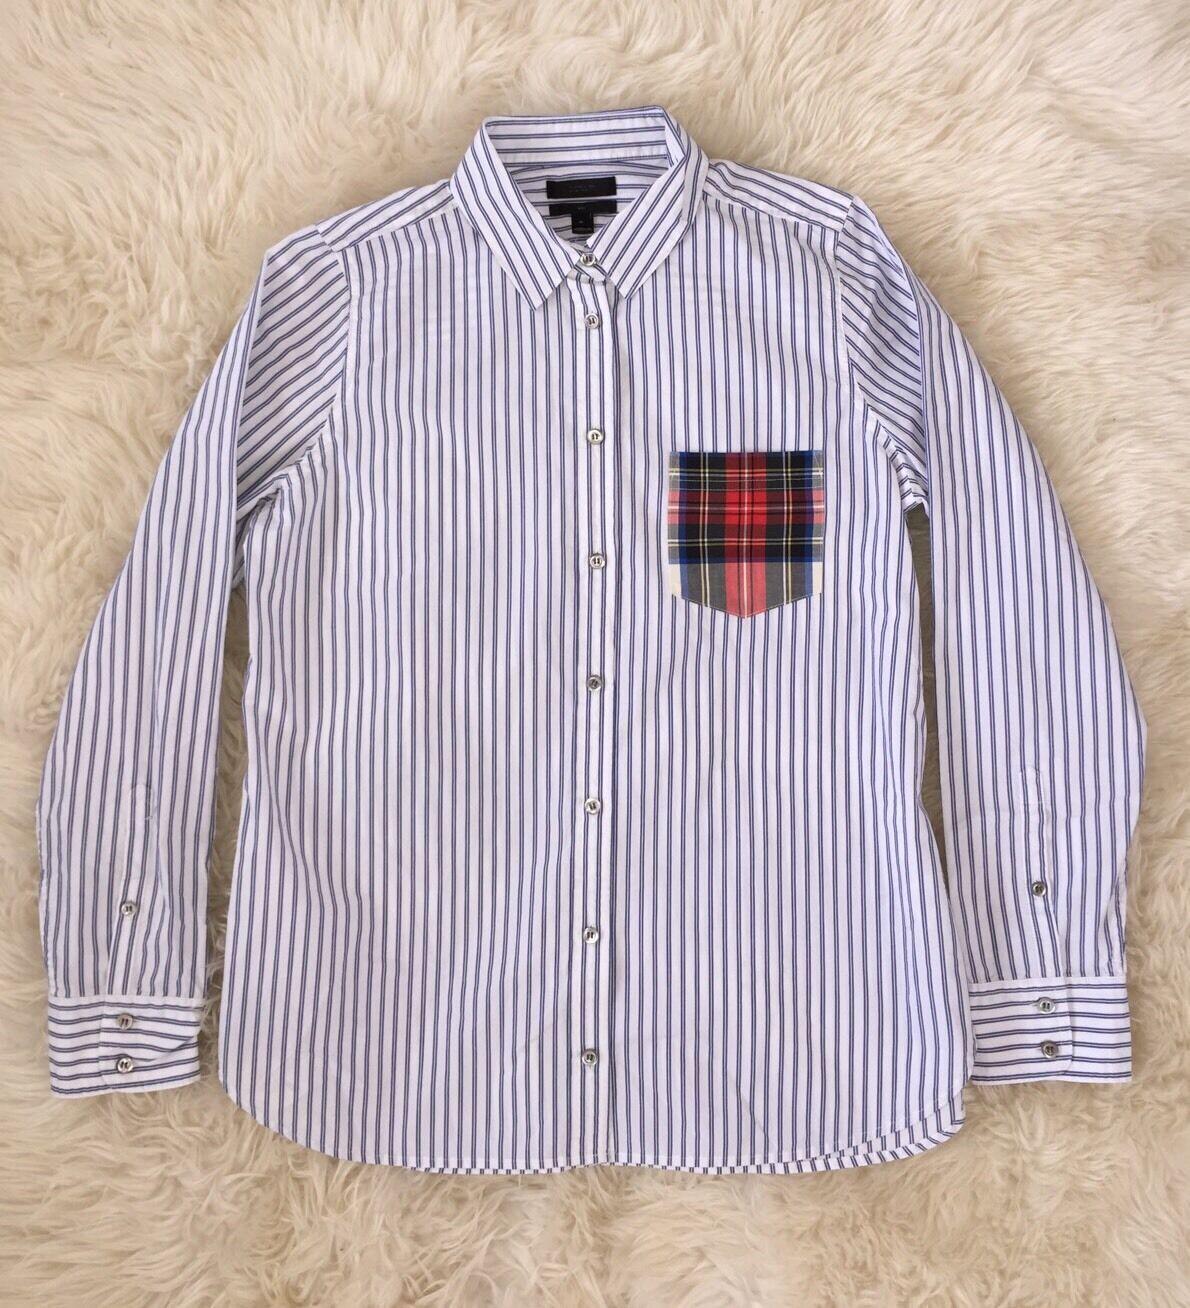 JCREW striped boy shirt with tartan pocket F8448 10 Weiß Blau SOLD-OUT